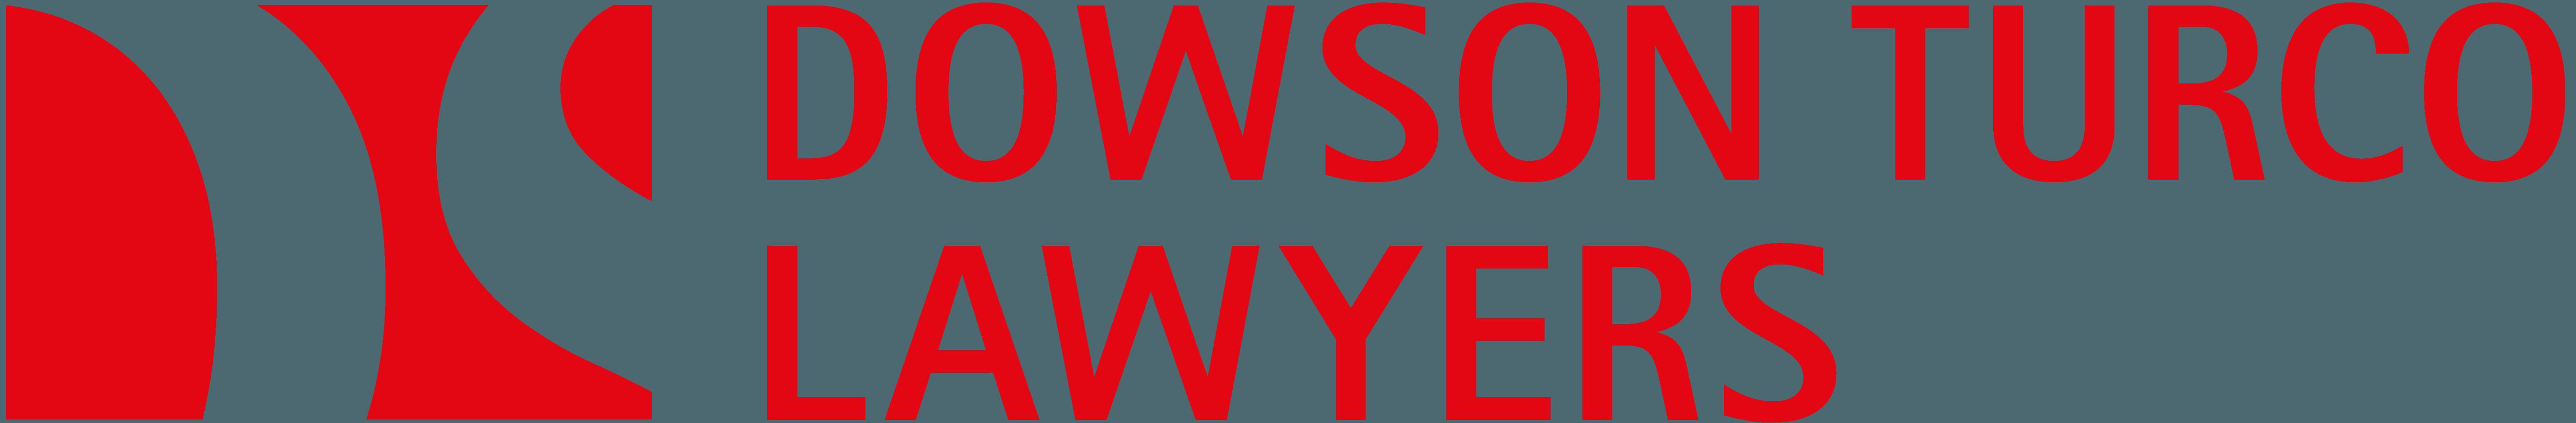 Dowson Turco's logo